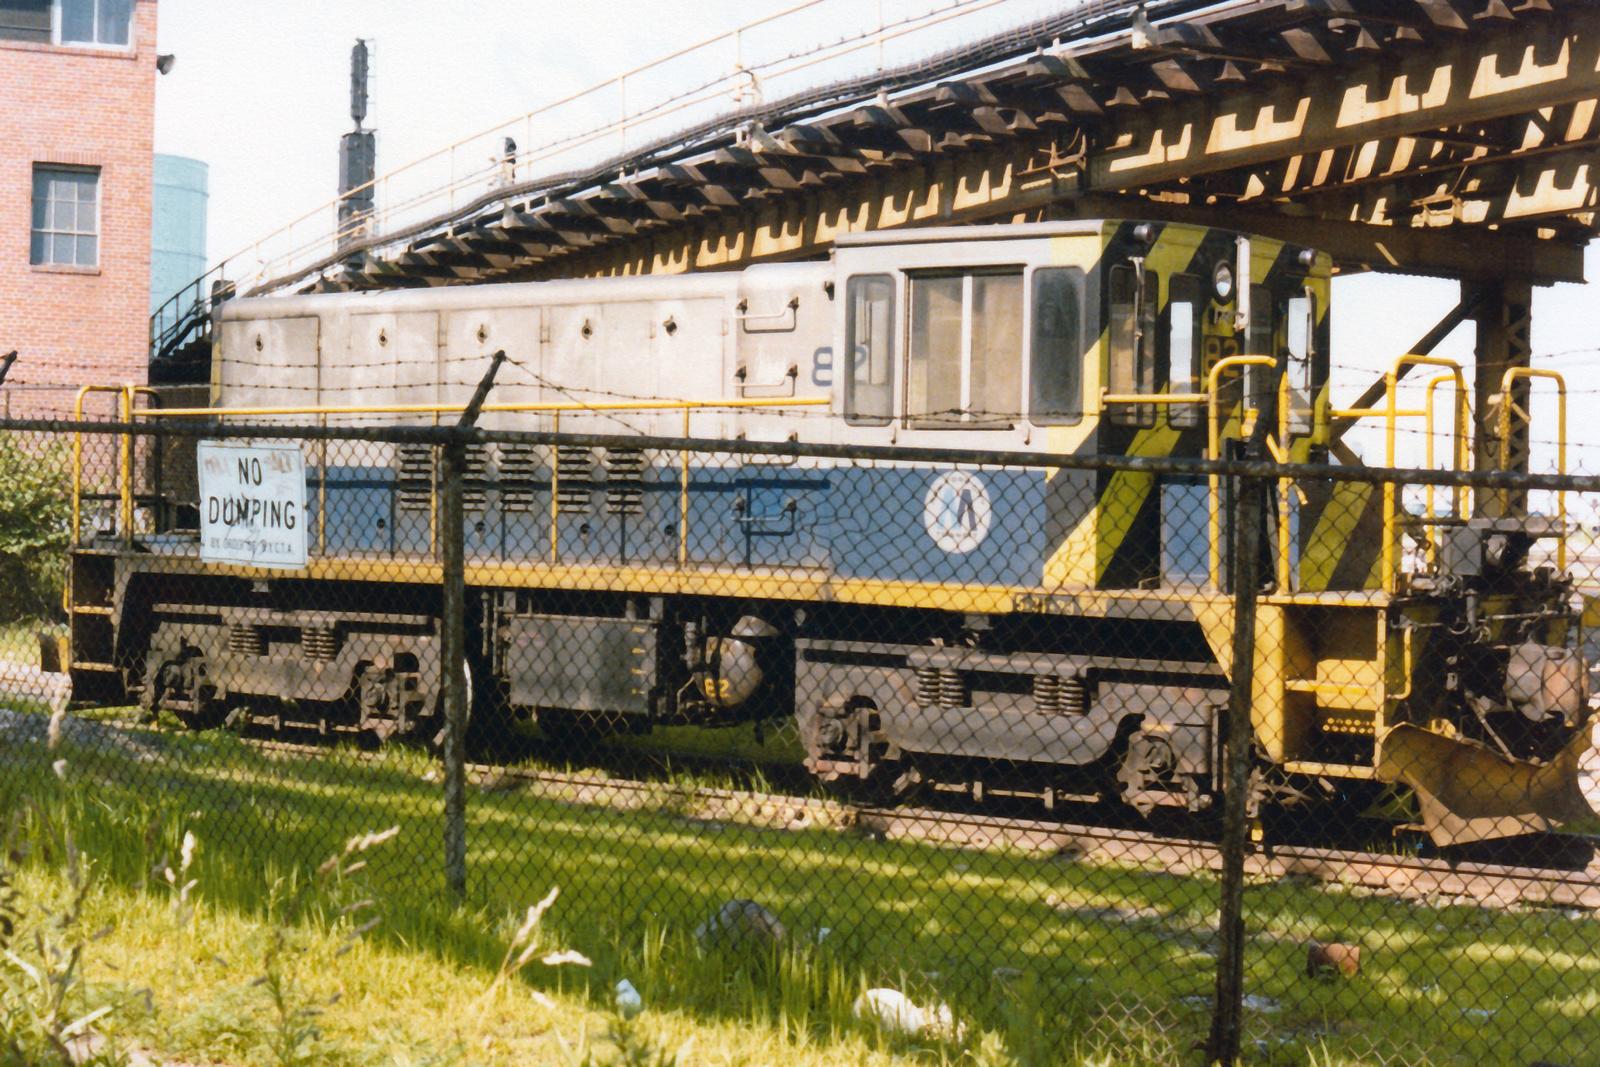 (1011k, 1600x1067)<br><b>Country:</b> United States<br><b>City:</b> New York<br><b>System:</b> New York City Transit<br><b>Location:</b> Coney Island Yard<br><b>Car:</b> R-52 Locomotive  82 <br><b>Collection of:</b> Nicholas Fabrizio<br><b>Viewed (this week/total):</b> 4 / 211